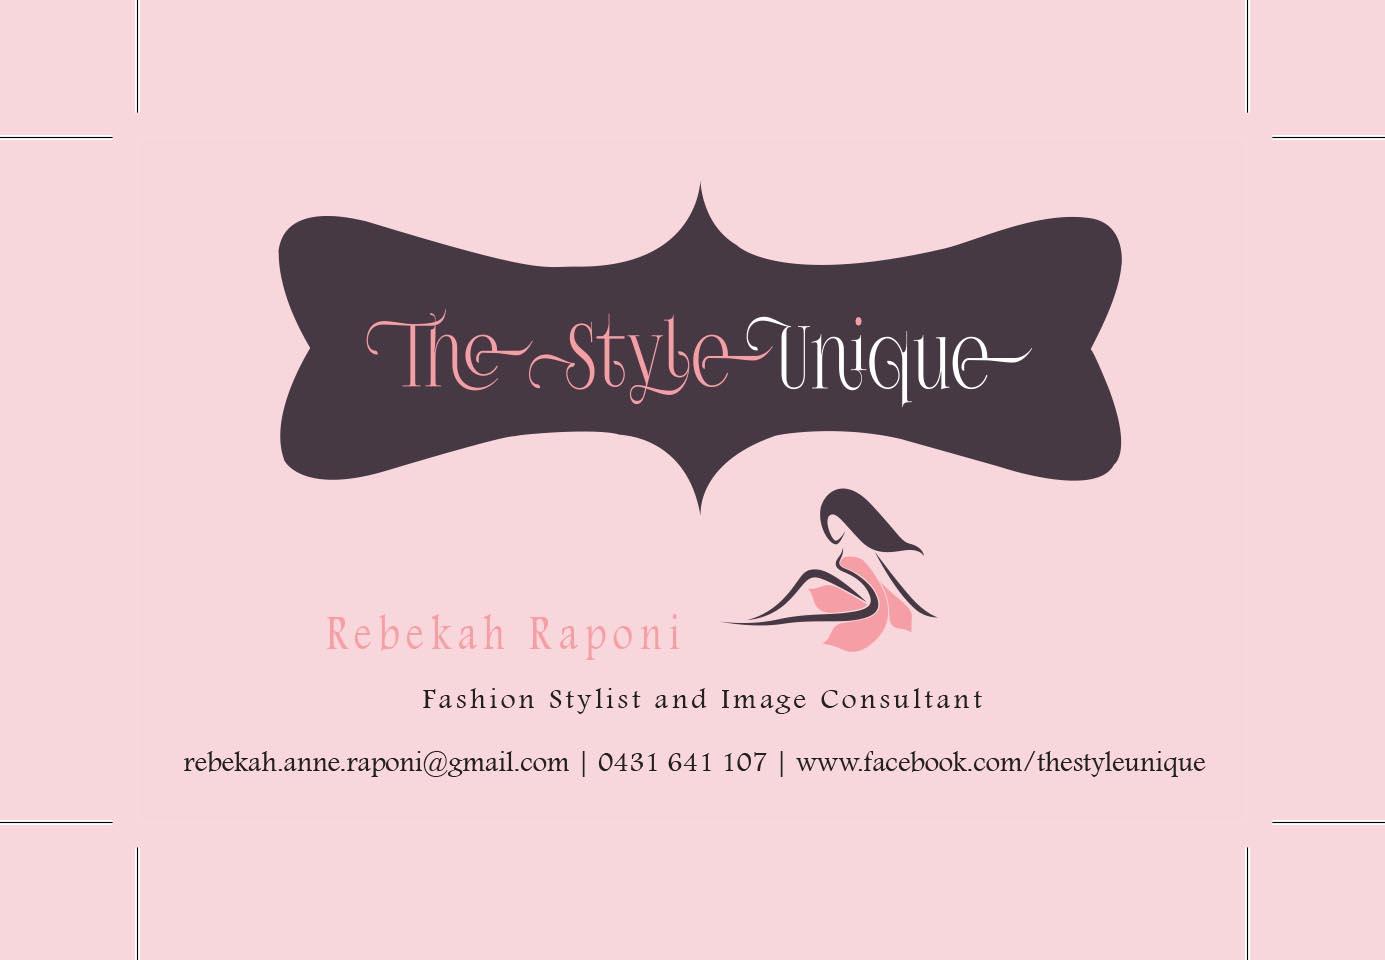 Upmarket modern business card design for rebekah raponi by smr business card design by smr designs for personal stylist business card design design 2962827 magicingreecefo Image collections